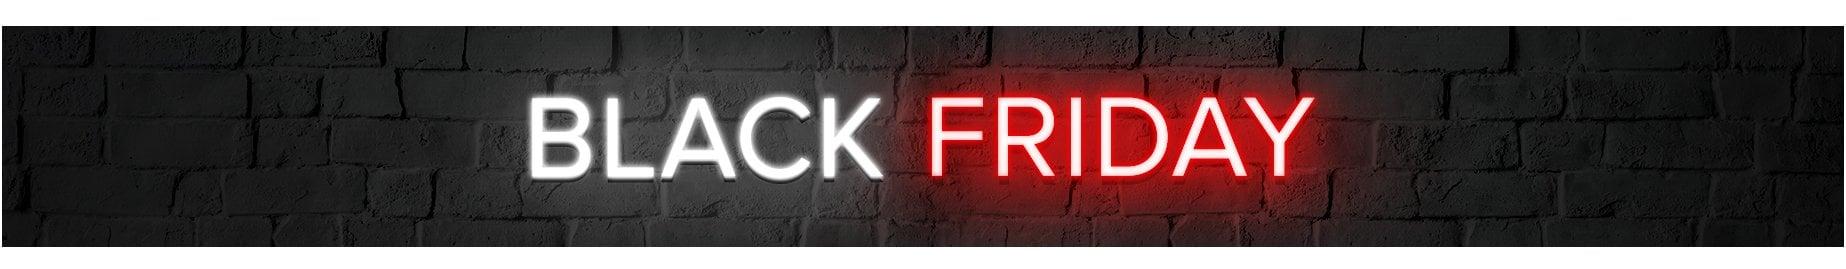 Black Friday 2020 Vape Deals Electric Tobacconist Usa